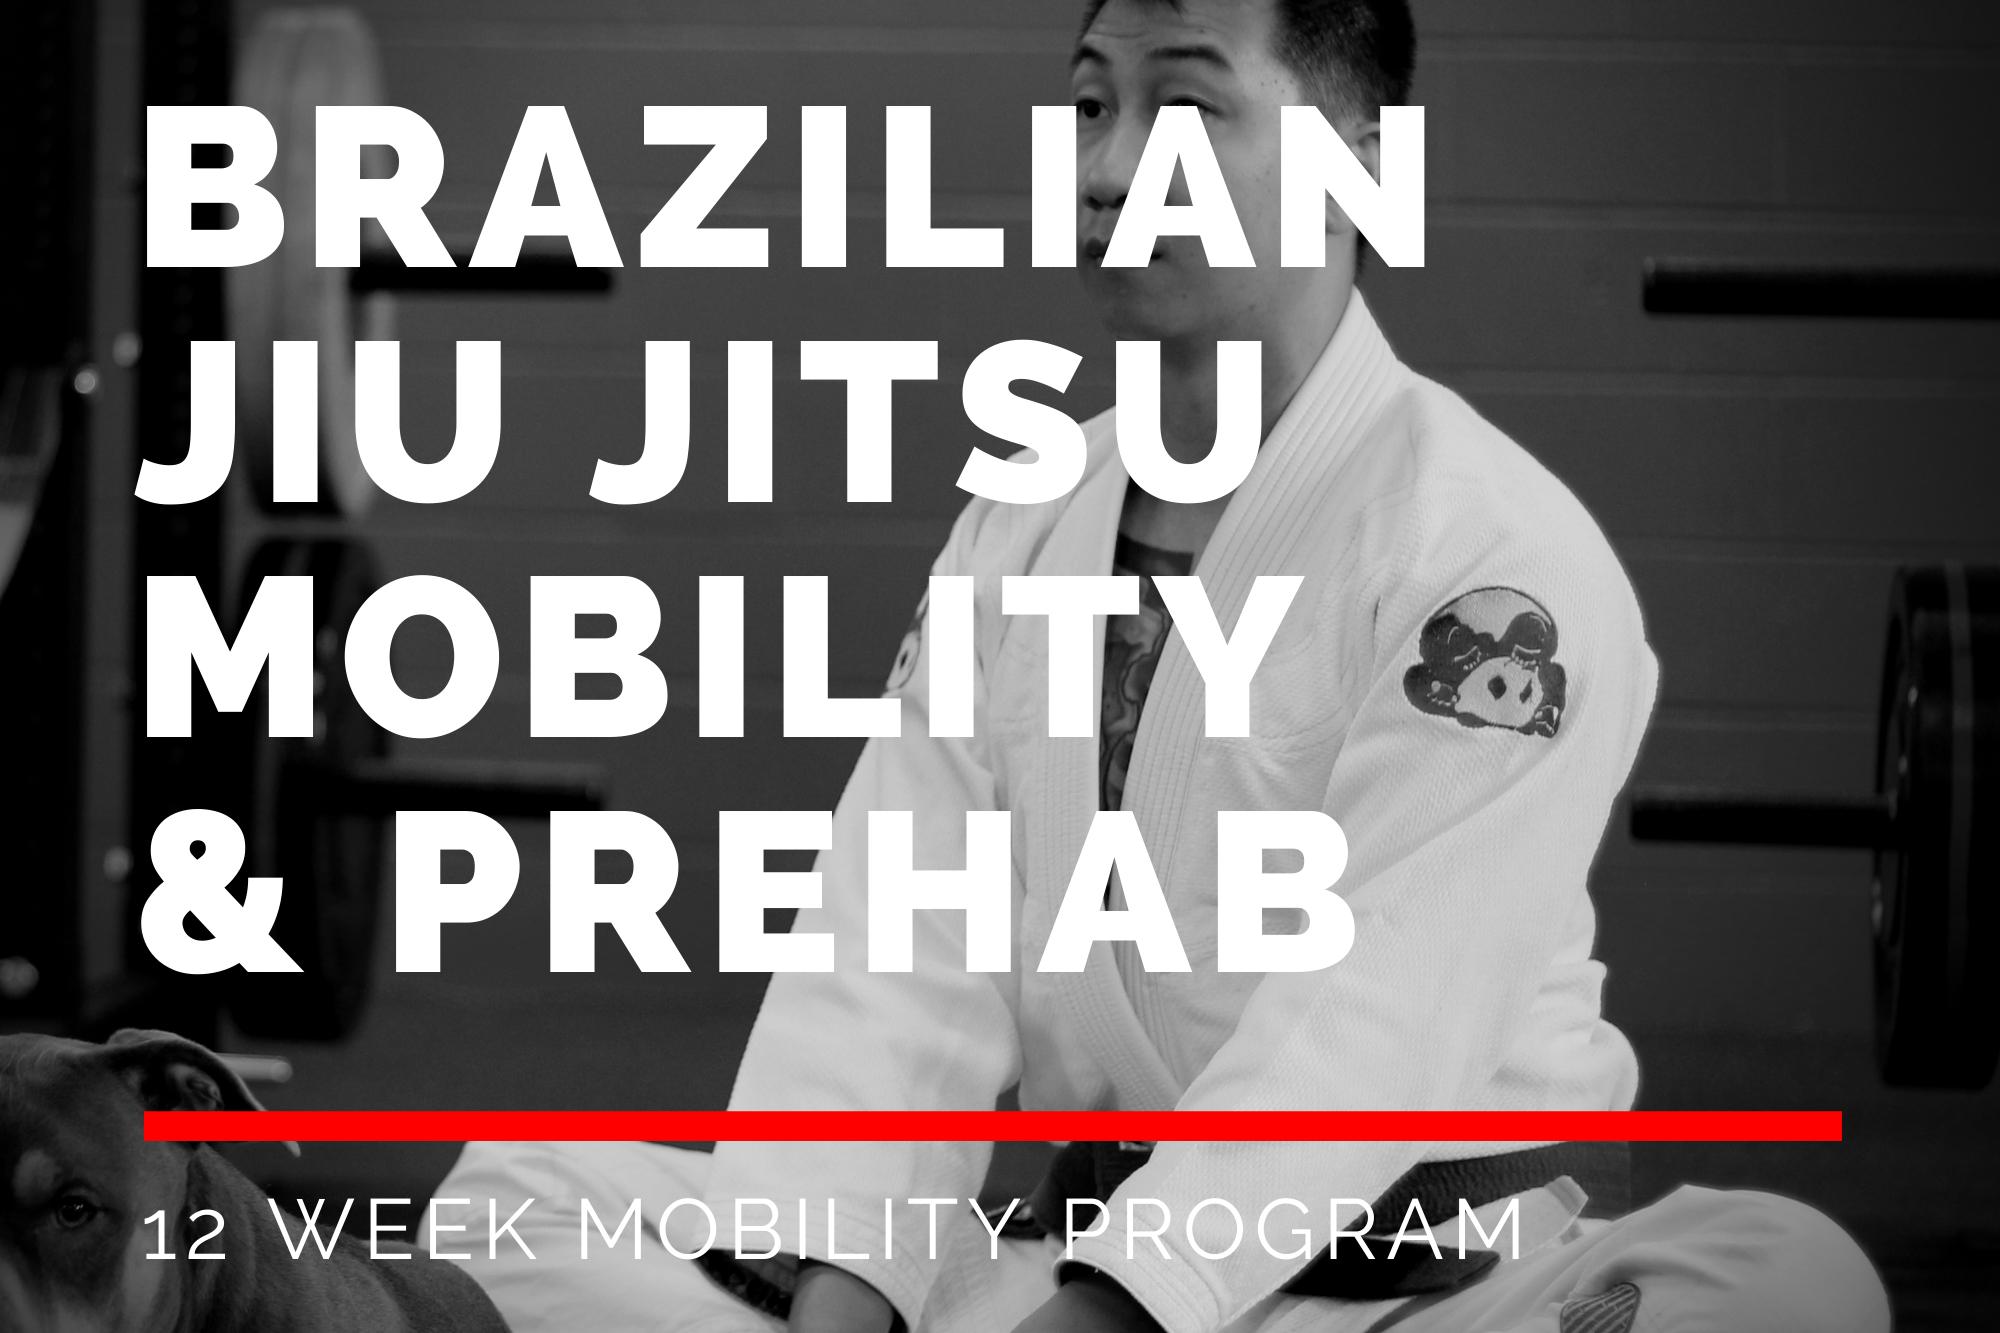 Brazilian Jiu Jitsu Mobility & Prehab Program